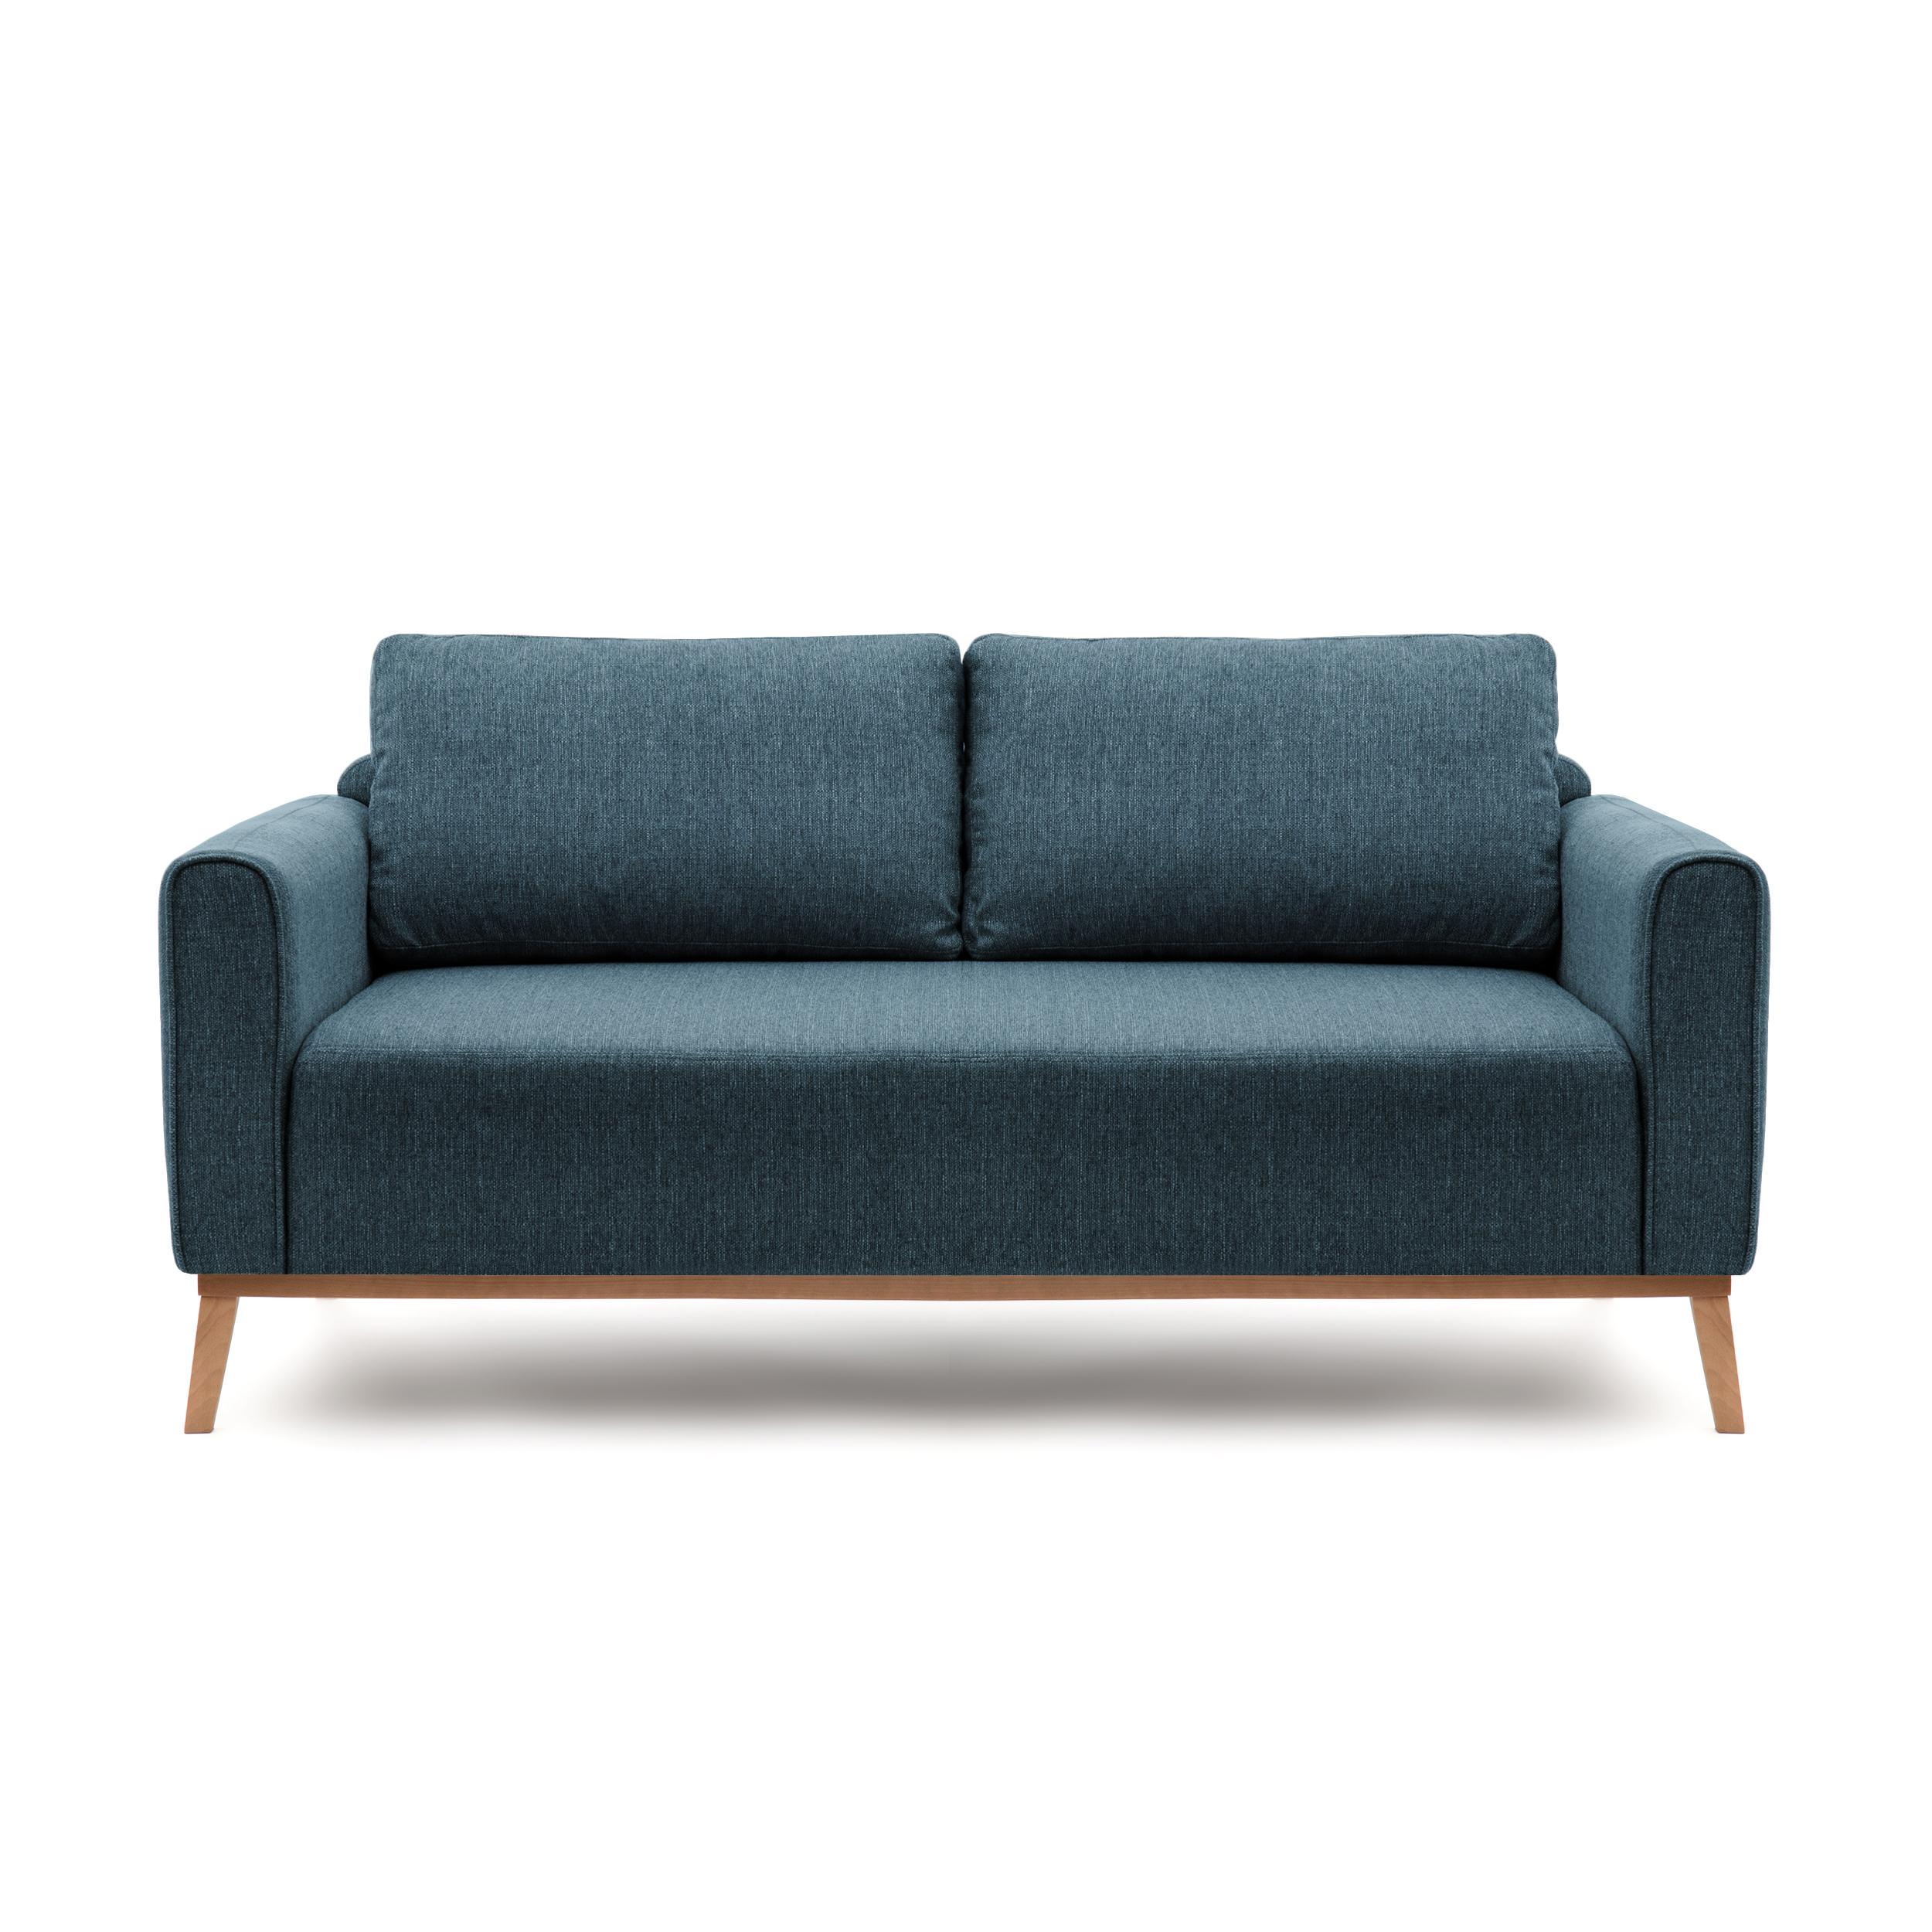 Canapea Fixa 3 locuri Milton Marine Blue